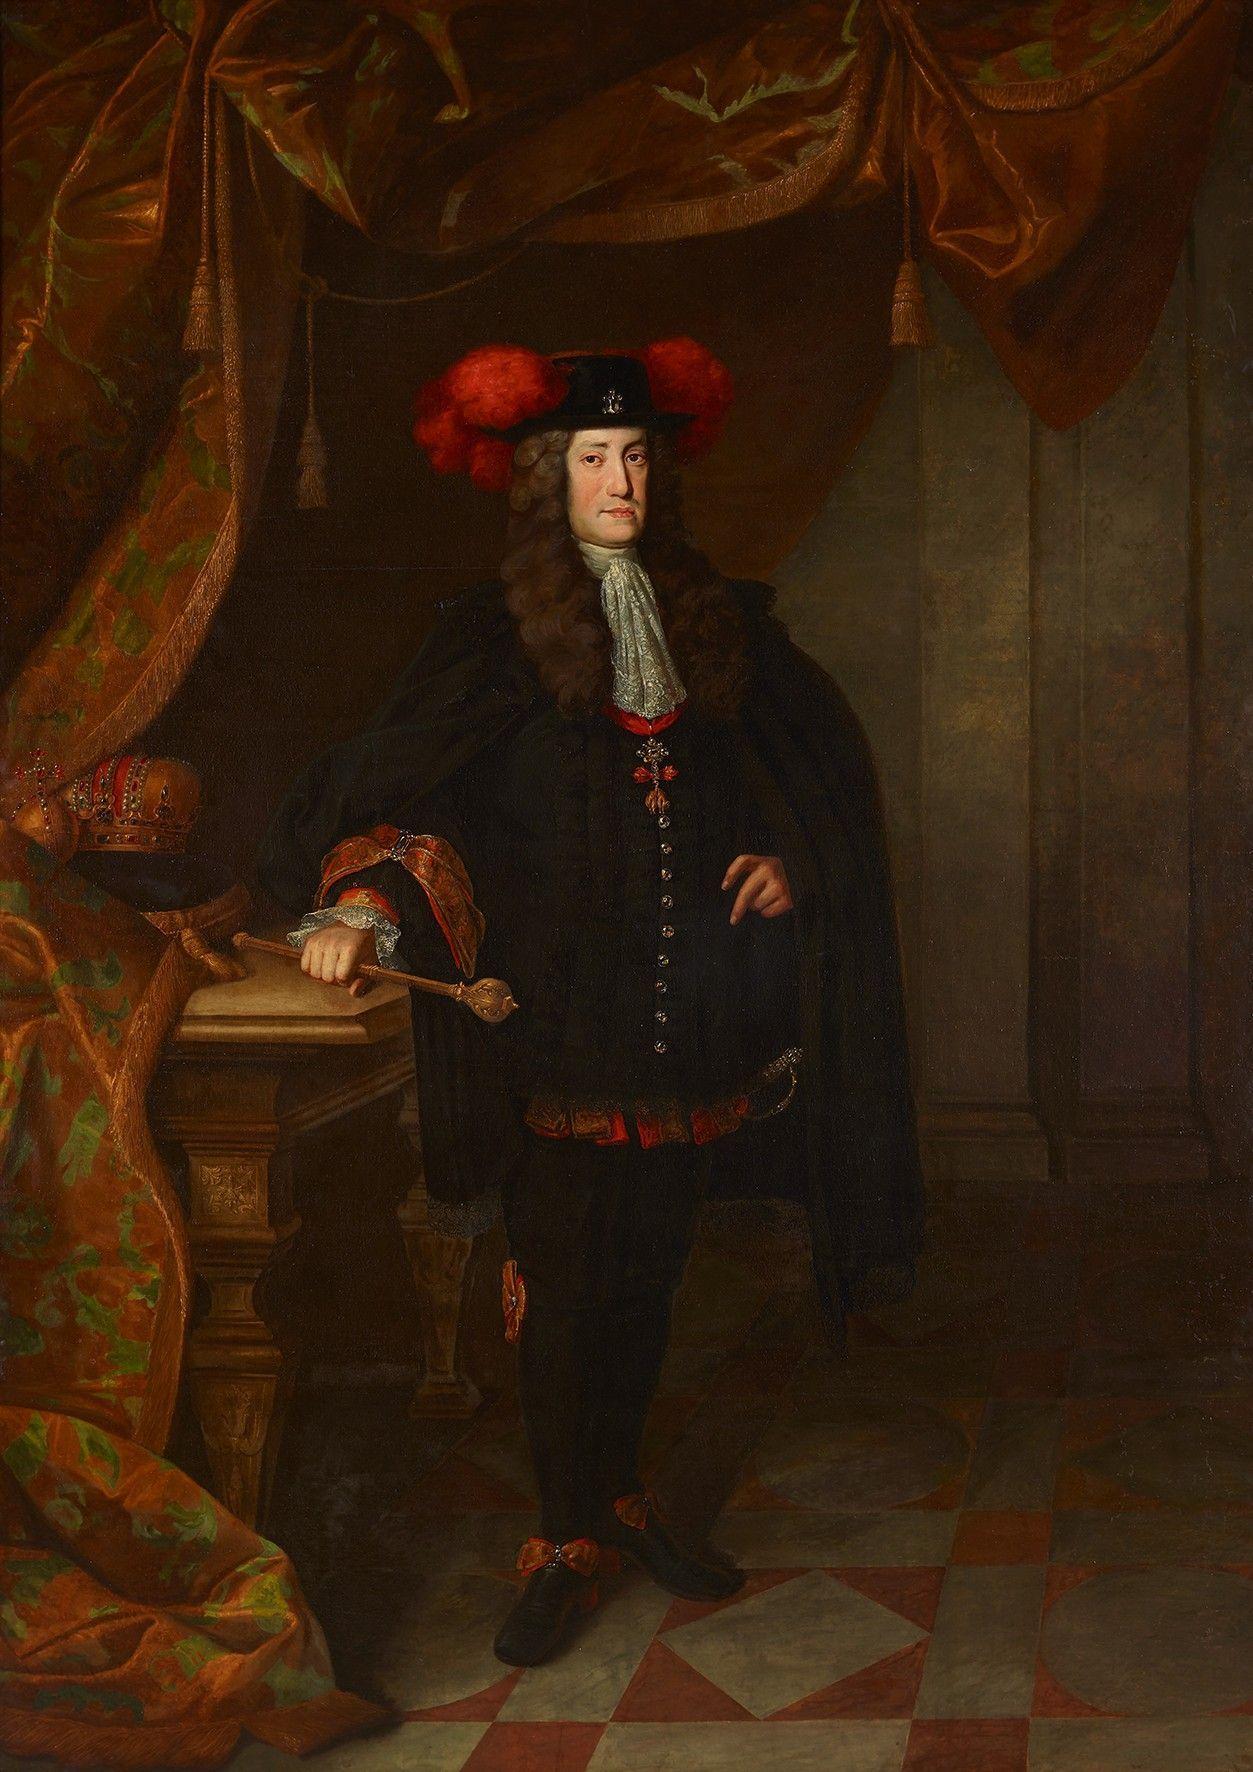 Johann Gottfried Auerbach, Kaiser Karl VI., 1730, Öl auf Leinwand, 262 x 188 cm © Belvedere, Wien